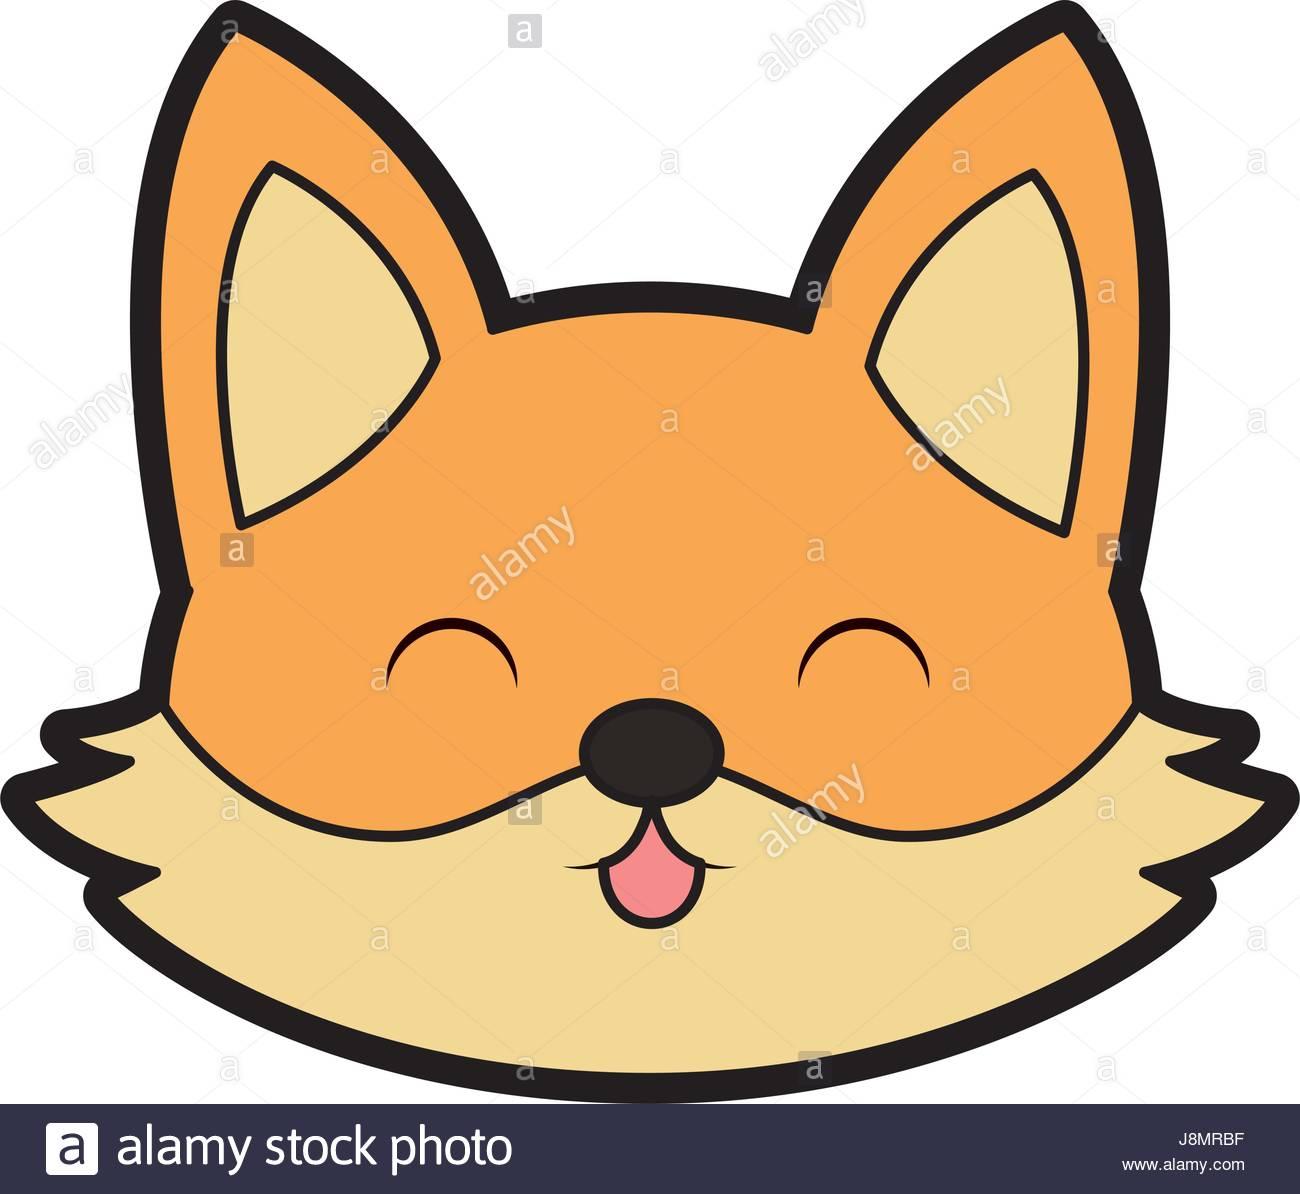 1300x1194 Cute Fox Face Cartoon Stock Vector Art Amp Illustration, Vector